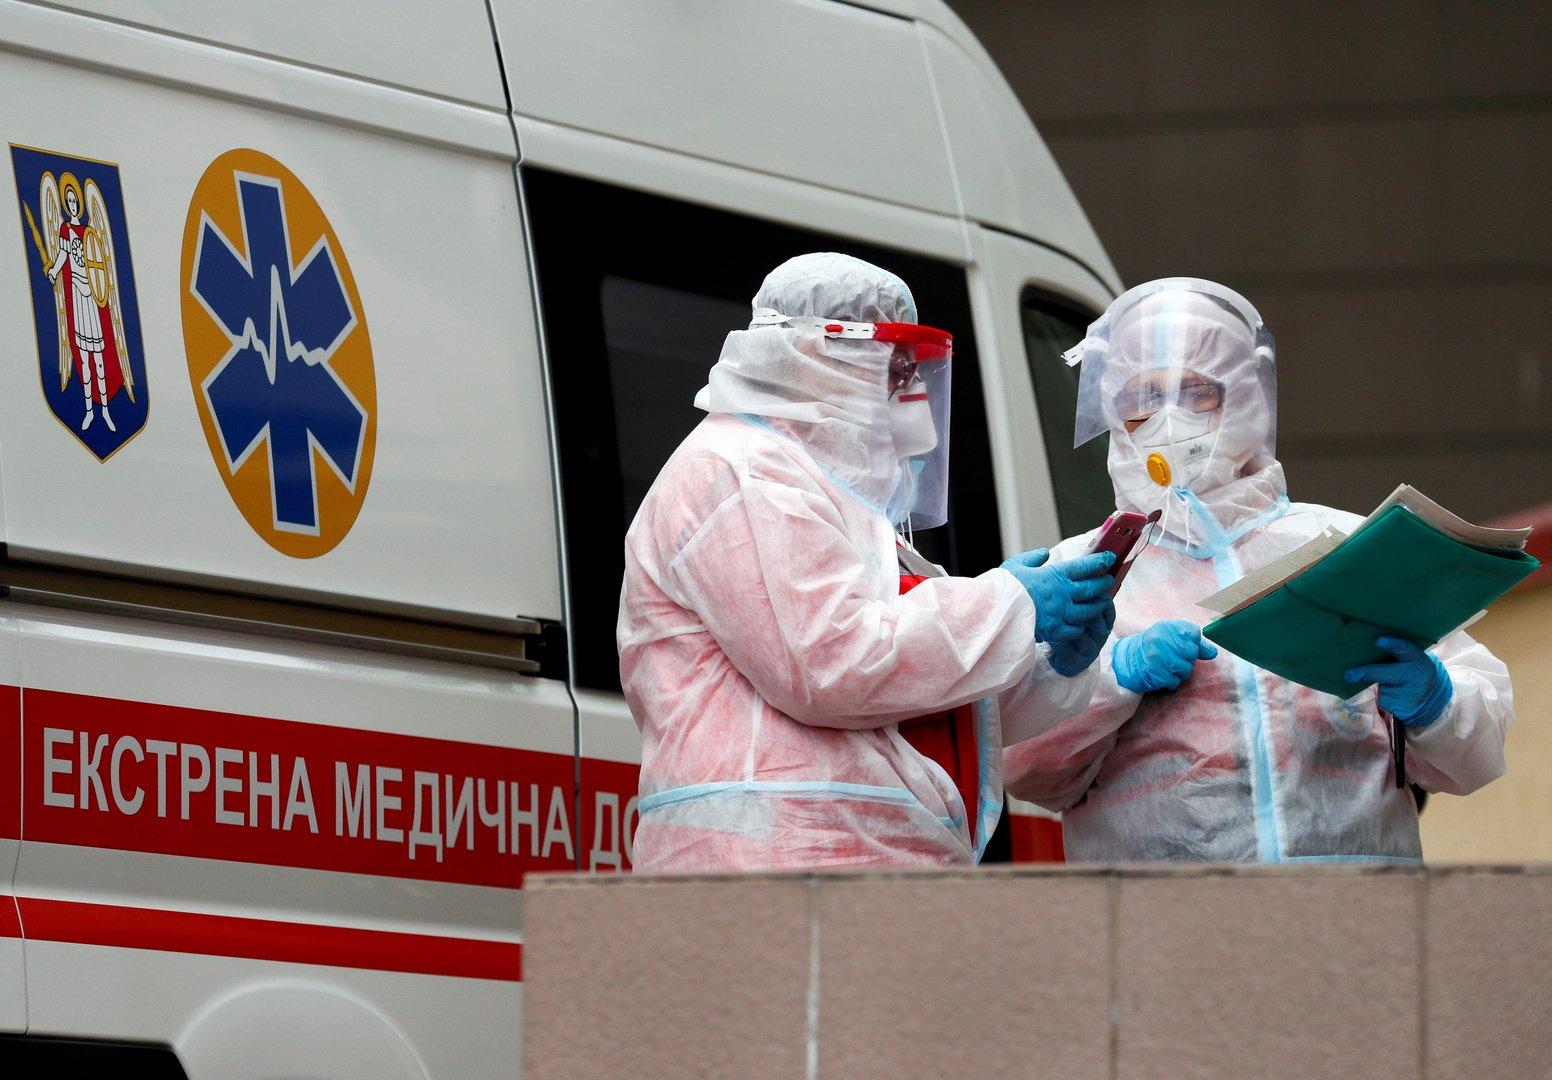 فيروس كورونا في اوكرانيا